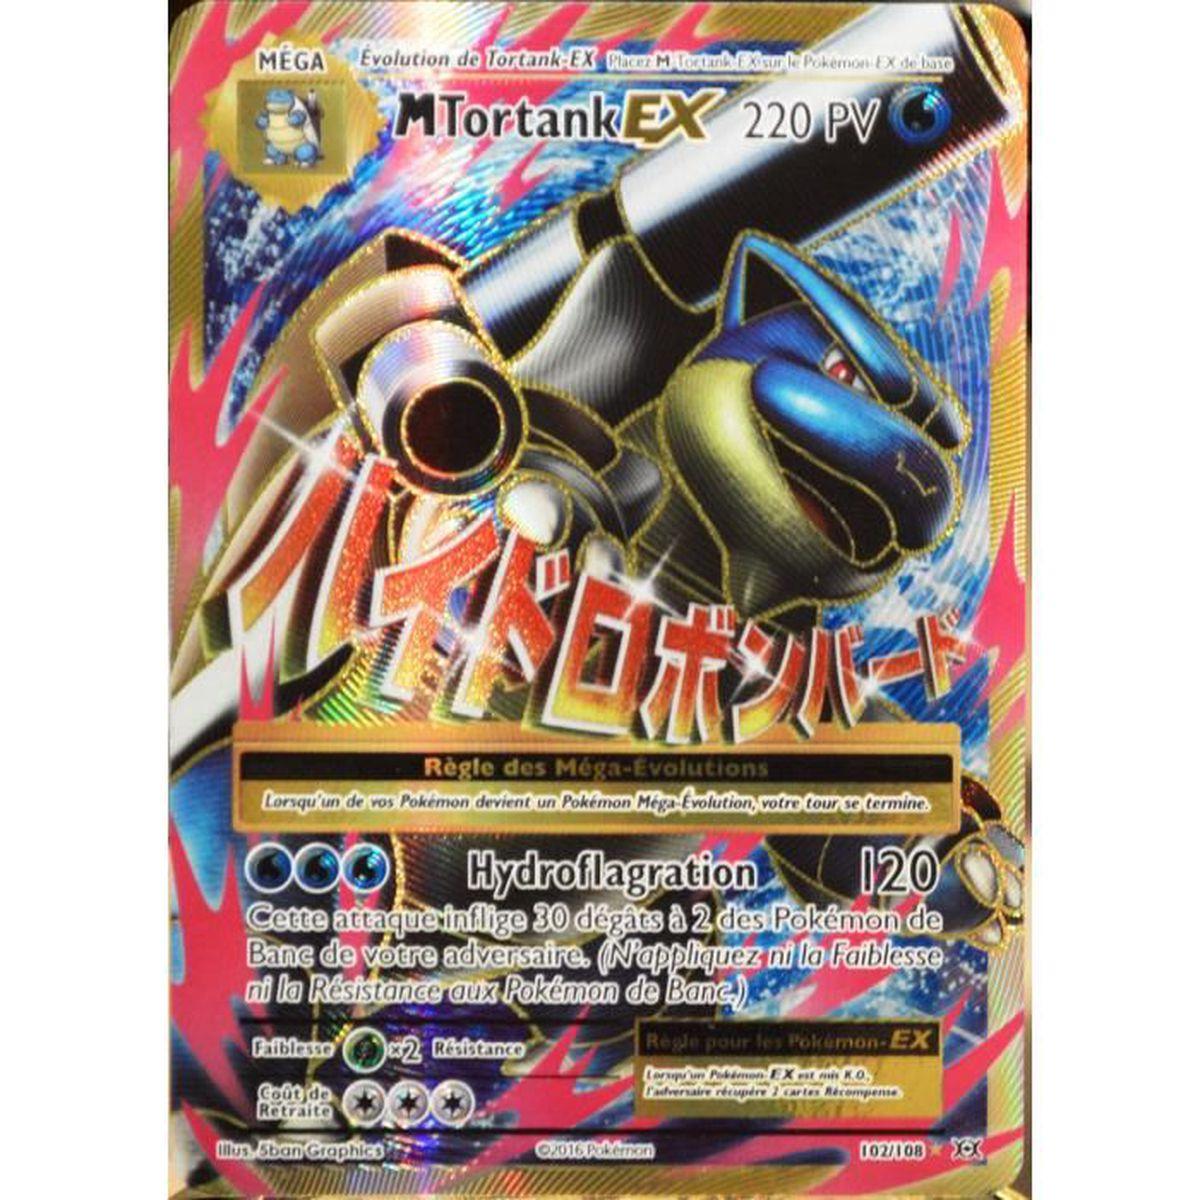 Carte pok mon 102 108 m ga tortank ex 220 pv full art xy - Carte pokemon electhor ex ...